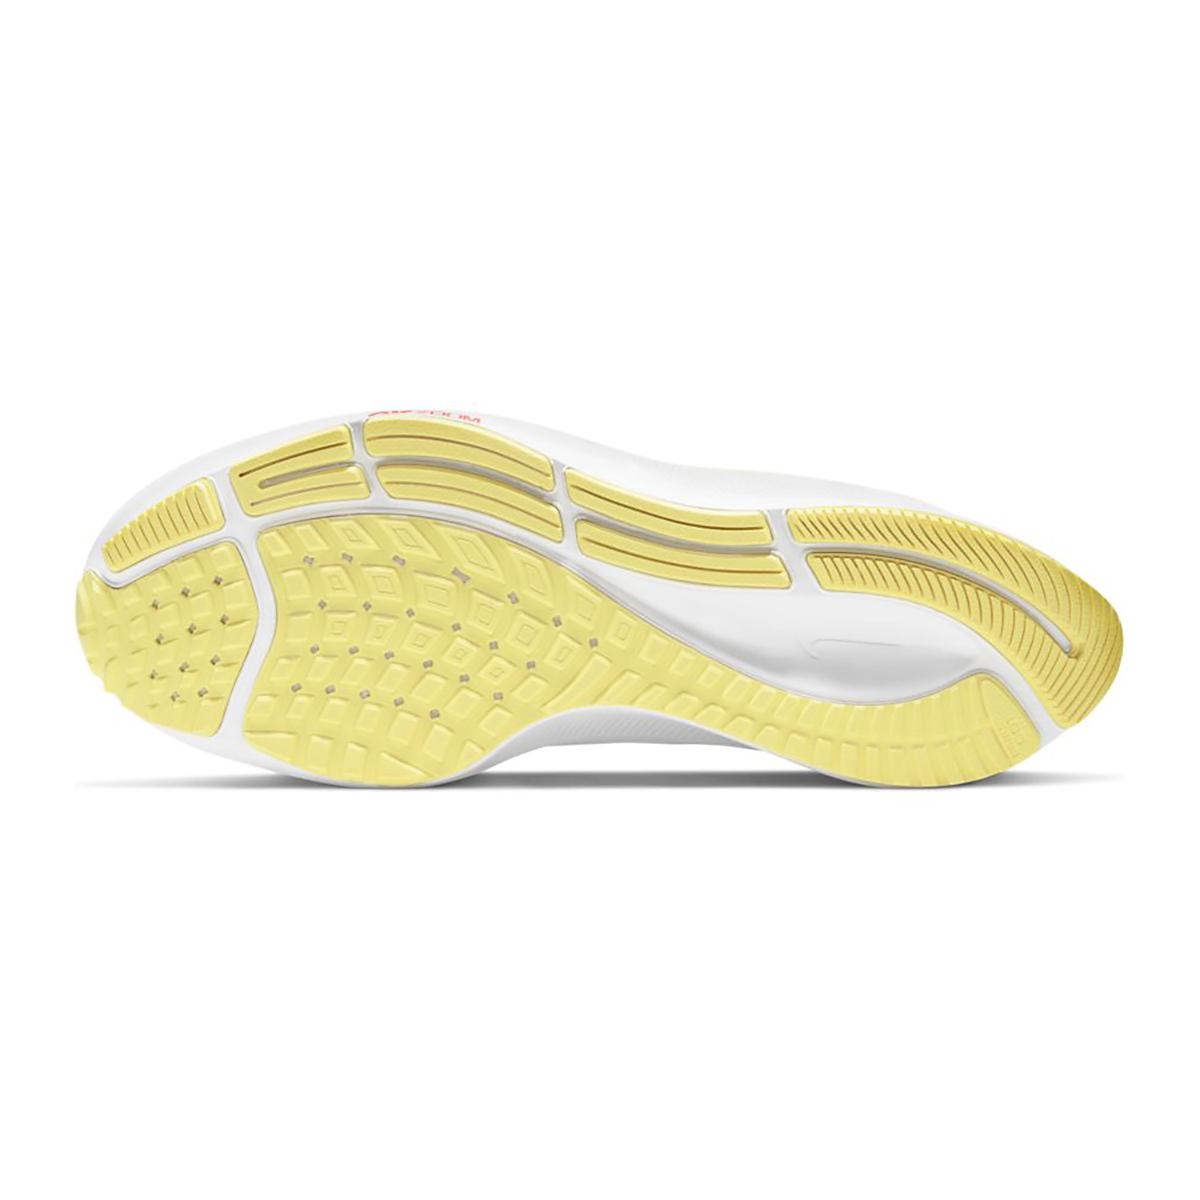 Women's Nike Air Zoom Pegasus 37 Running Shoe - Color: White/Lite Zitron/Bright Mango - Size: 5 - Width: Regular, White/Lite Zitron/Bright Mango, large, image 3